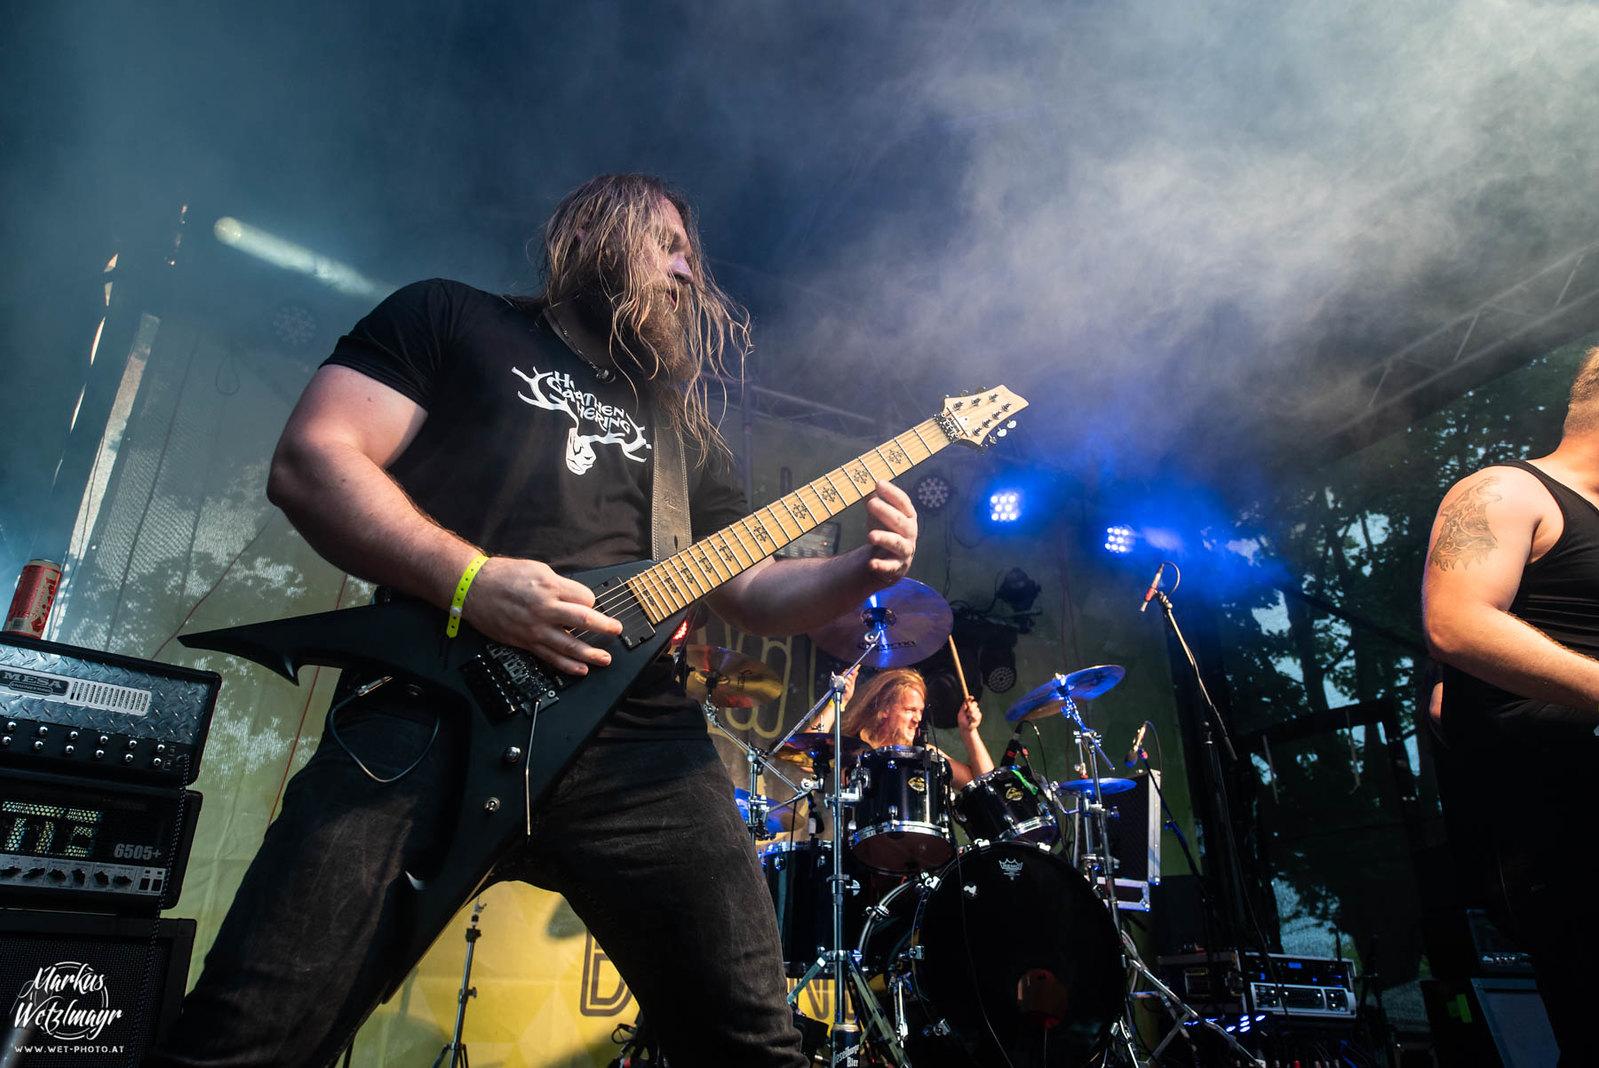 INTERREGNUM - Metalheads Against Racism Vol. 8, Donauinselfest Vienna